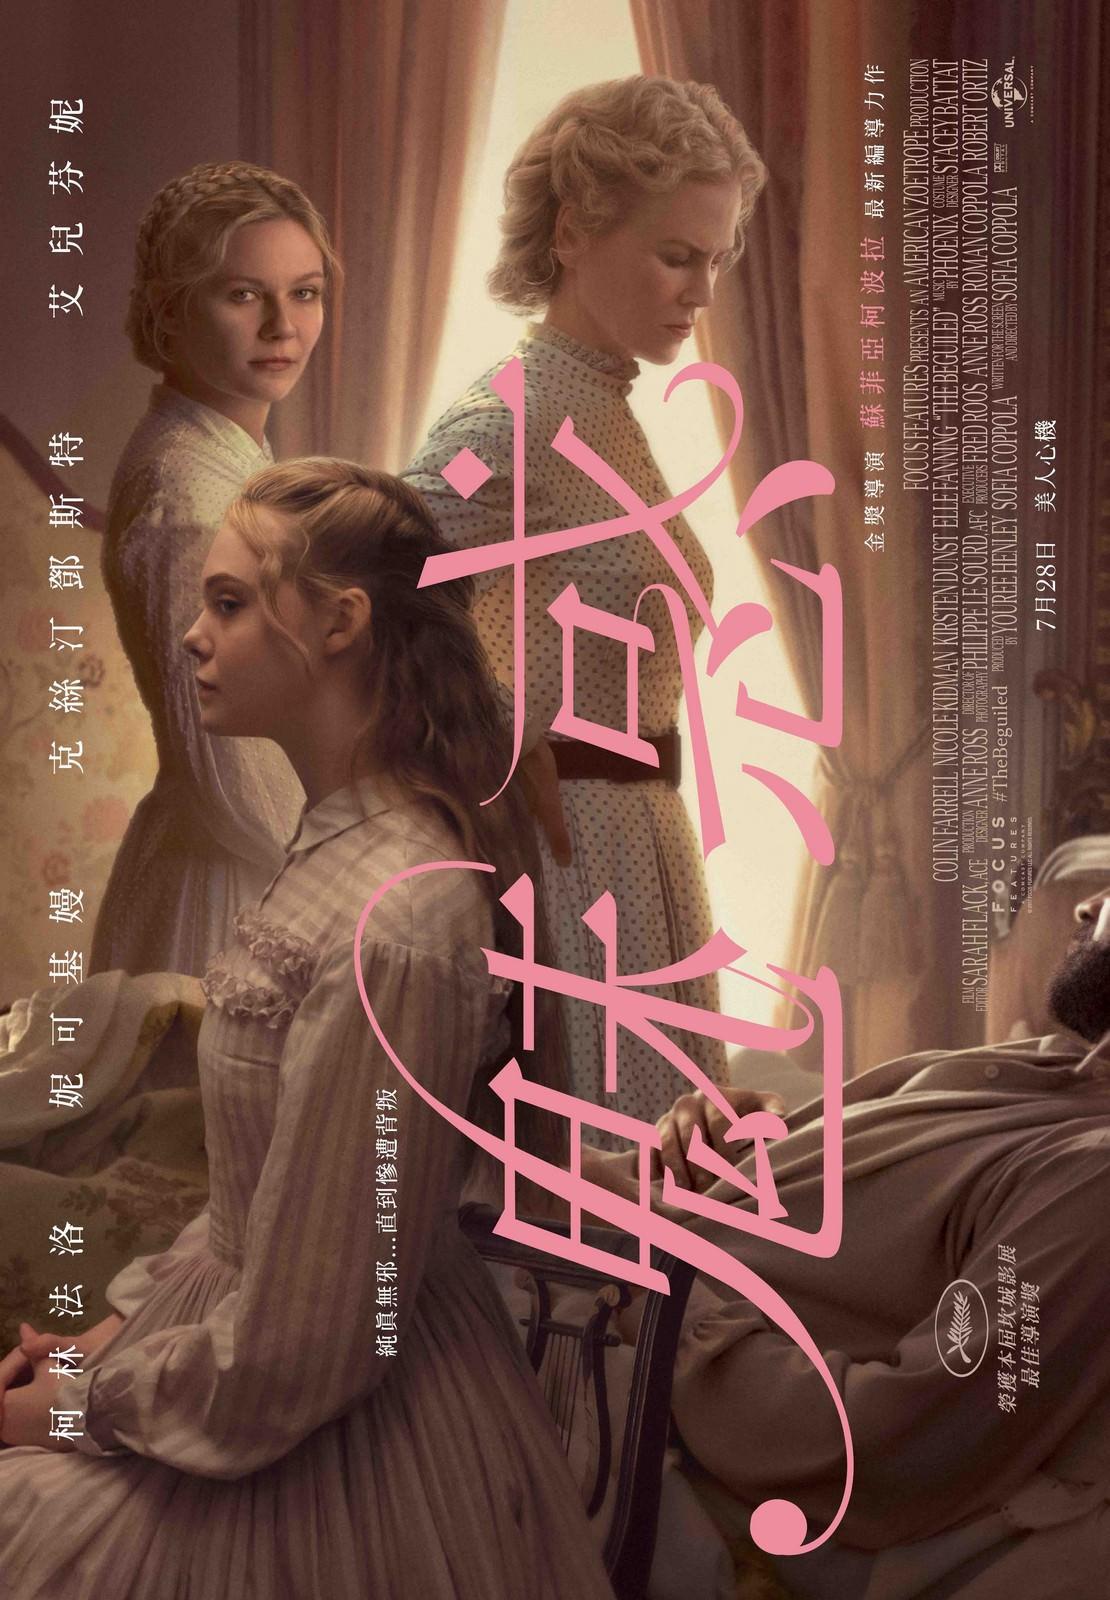 Movie, The Beguiled(美國, 2017年) / 魅惑(台灣) / 美麗有毒(香港) / 牡丹花下(網路), 電影海報, 台灣